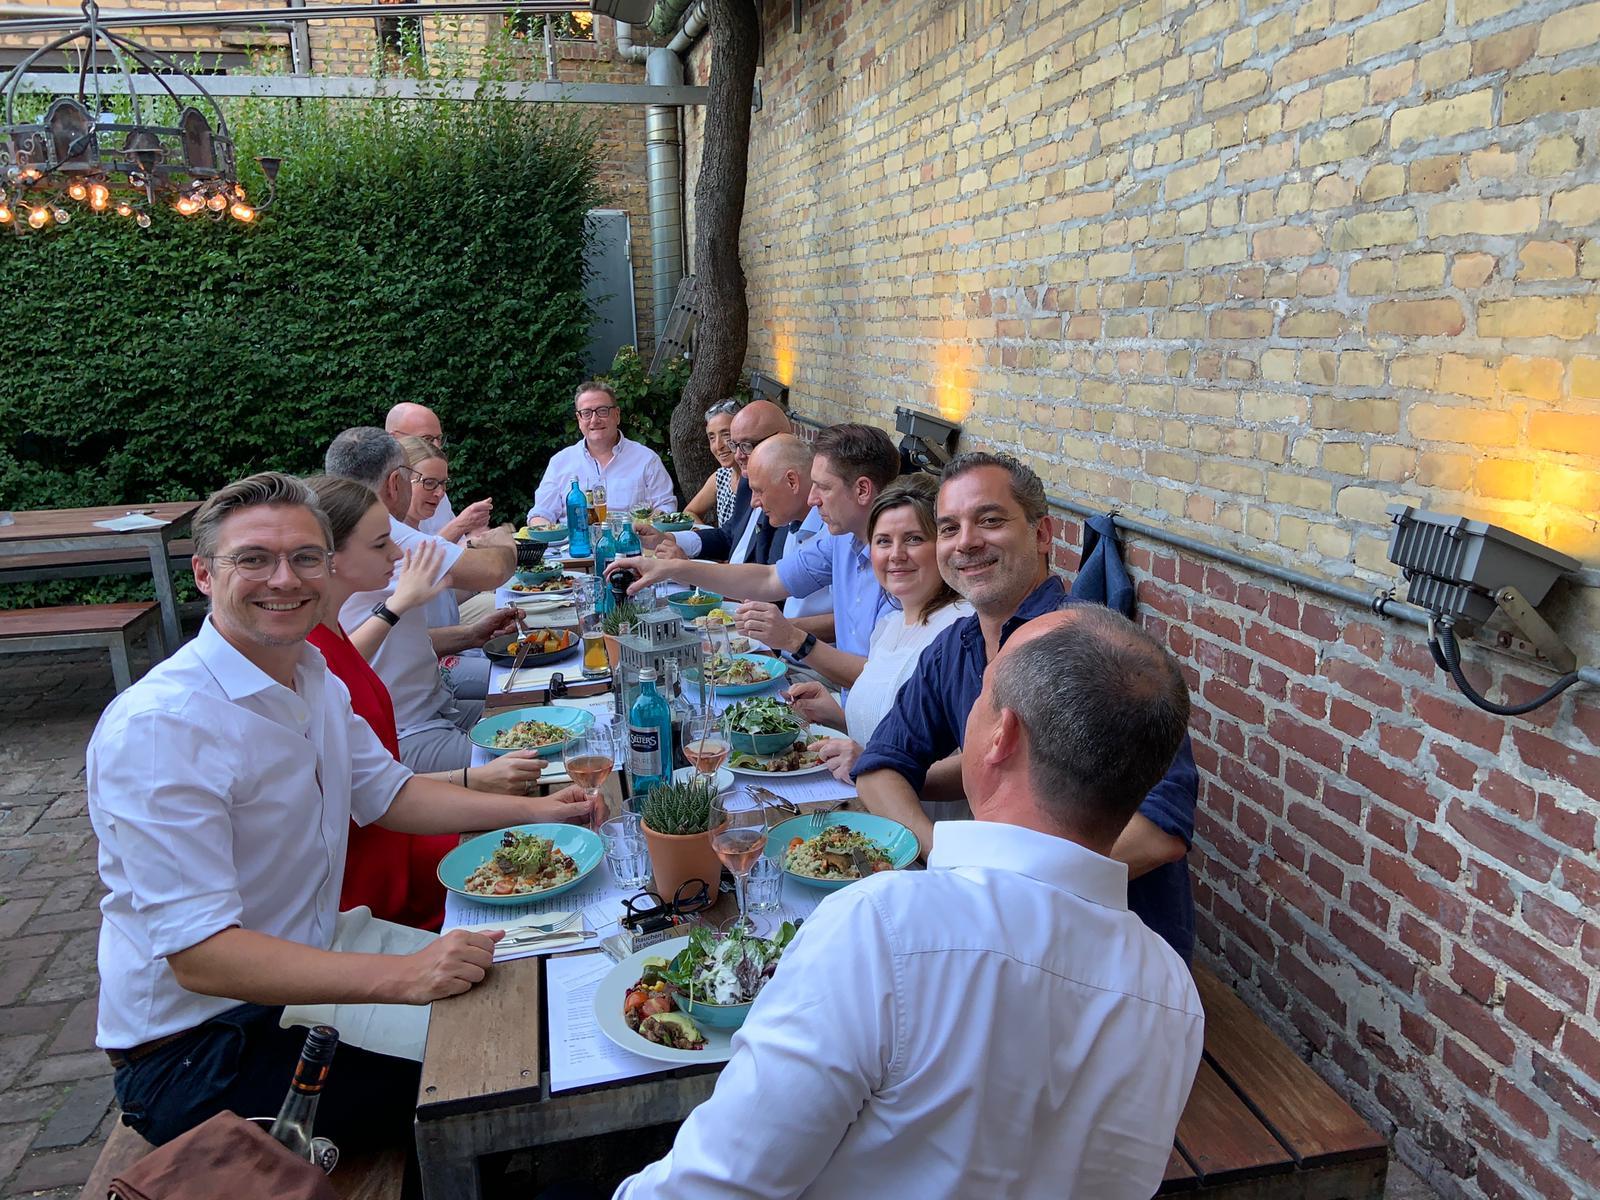 AHV NRW ATC Spoerl Fabrik Mitgliedertreffen